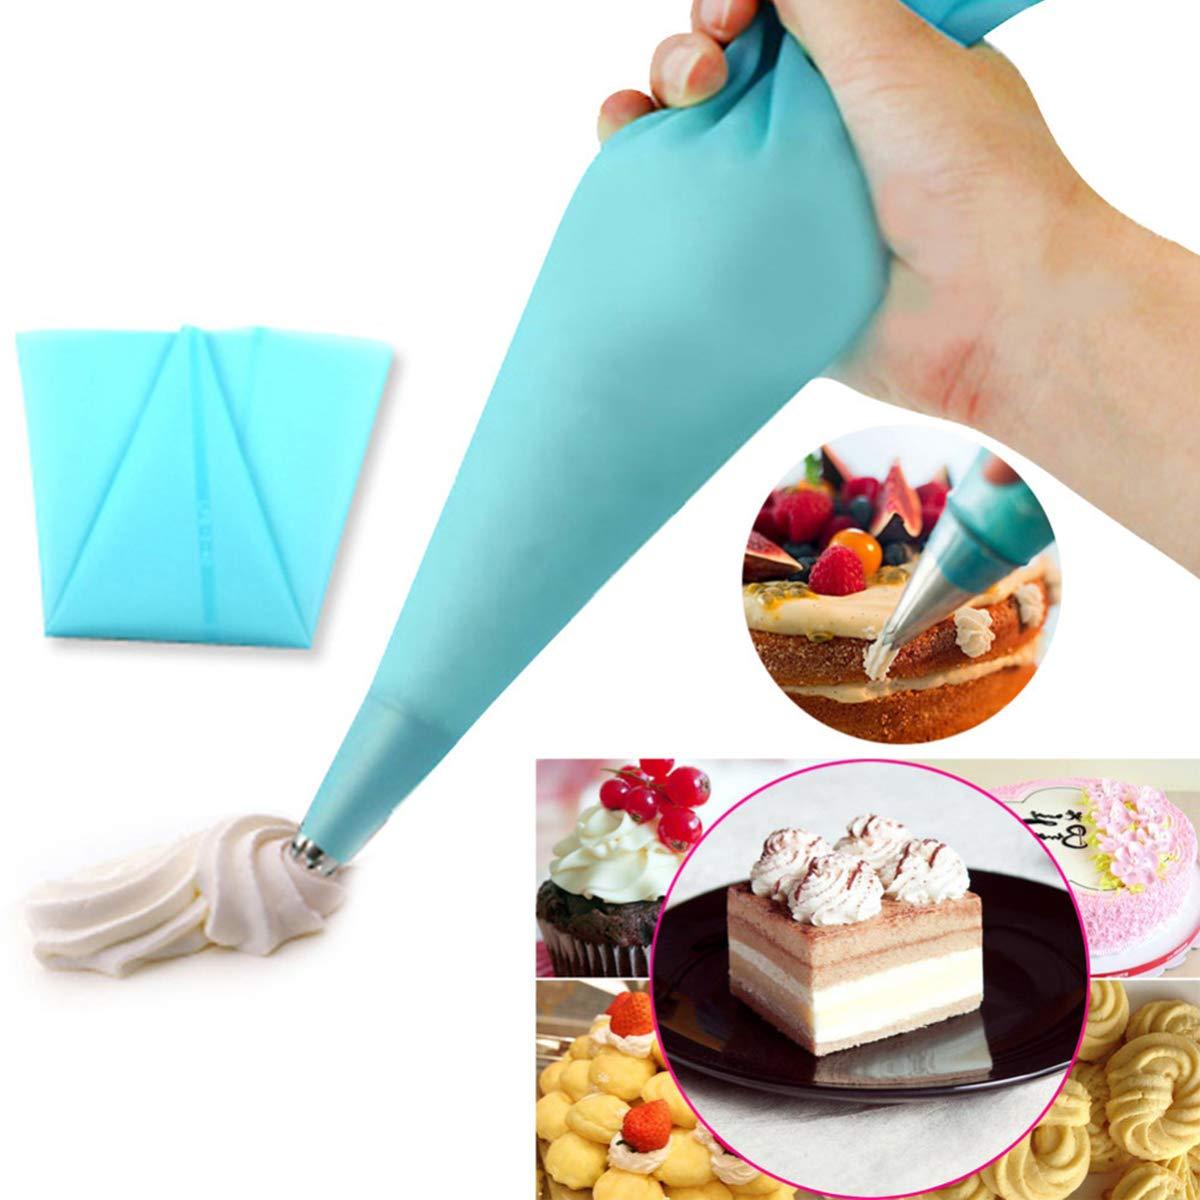 OUMOSI Fondant Cake DIY Decorating Tools Set Kit 6Pcs Cake Decorating Tips Set+1 Reusable Silicone Piping Pastry Icing Bag+1 Piping Tips Coupler